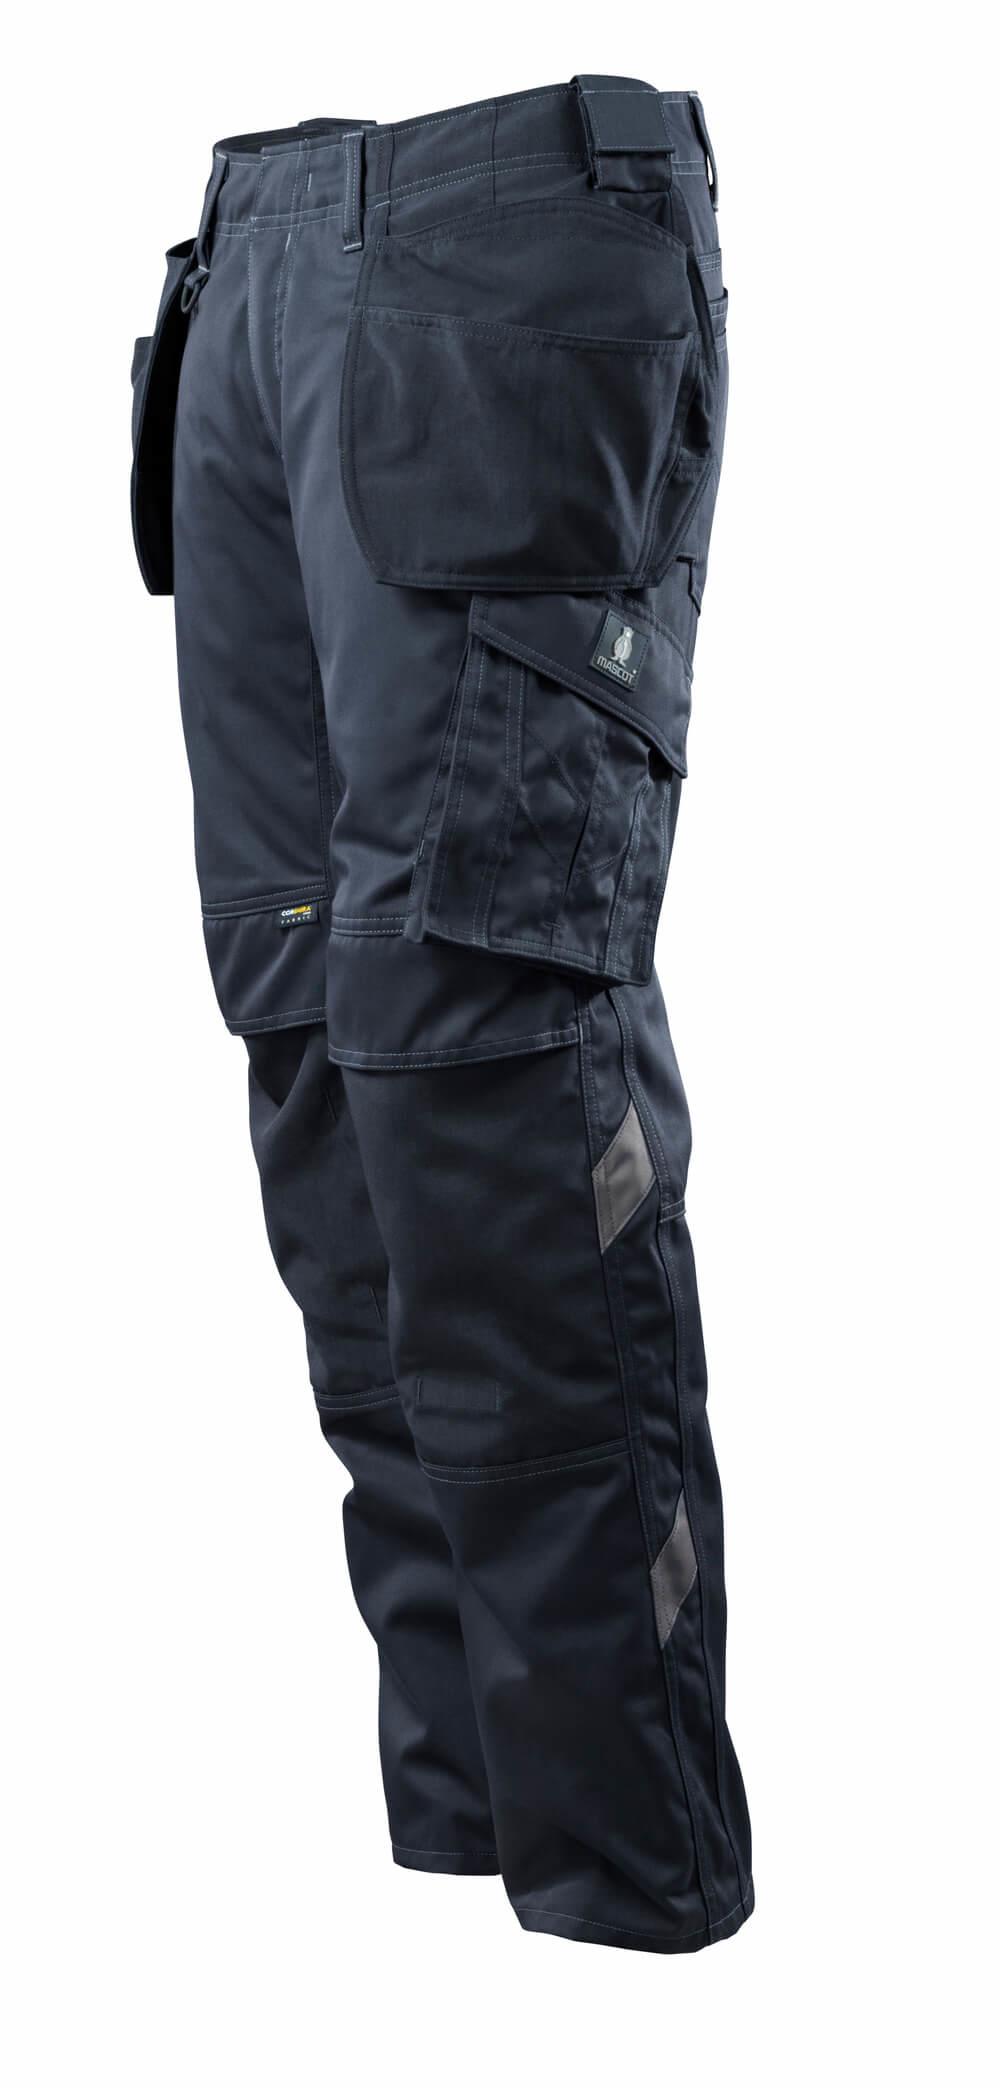 Trousers, holster pockets, lightweight